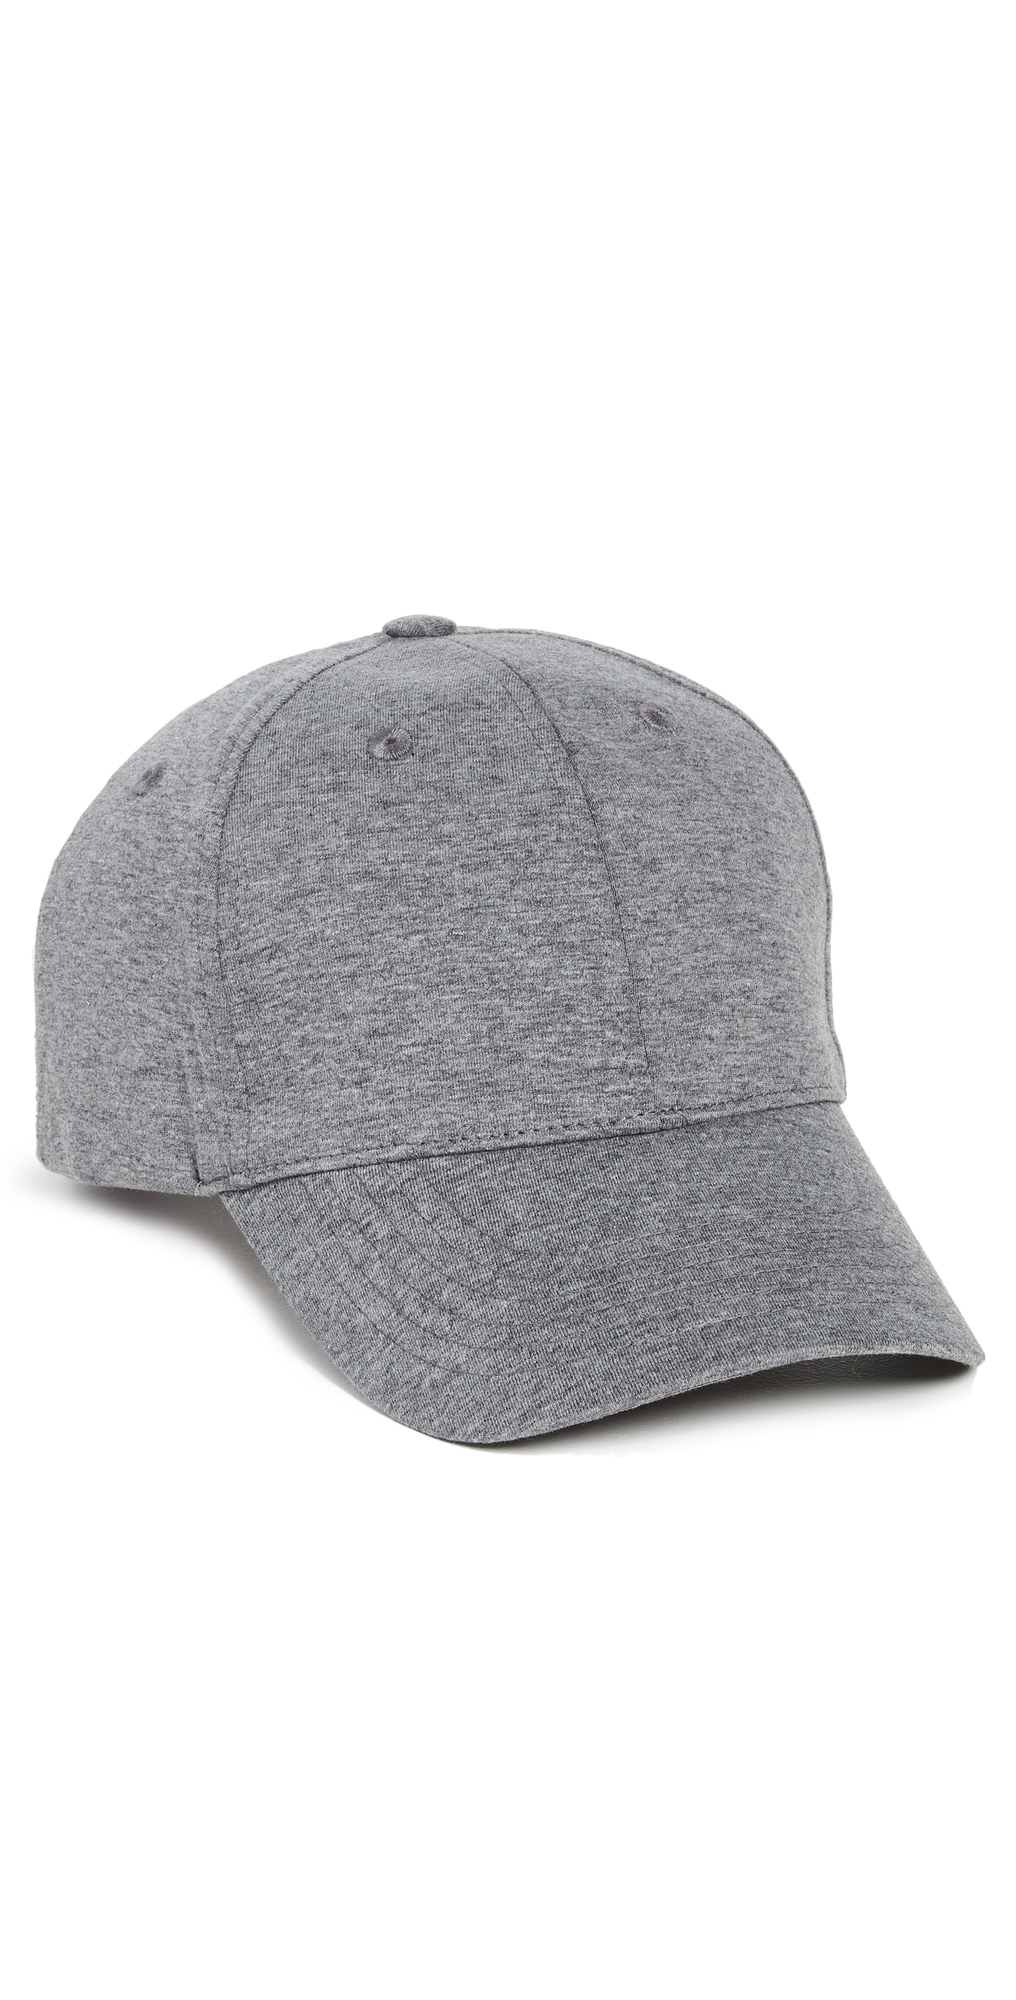 Athleisure Baseball Cap